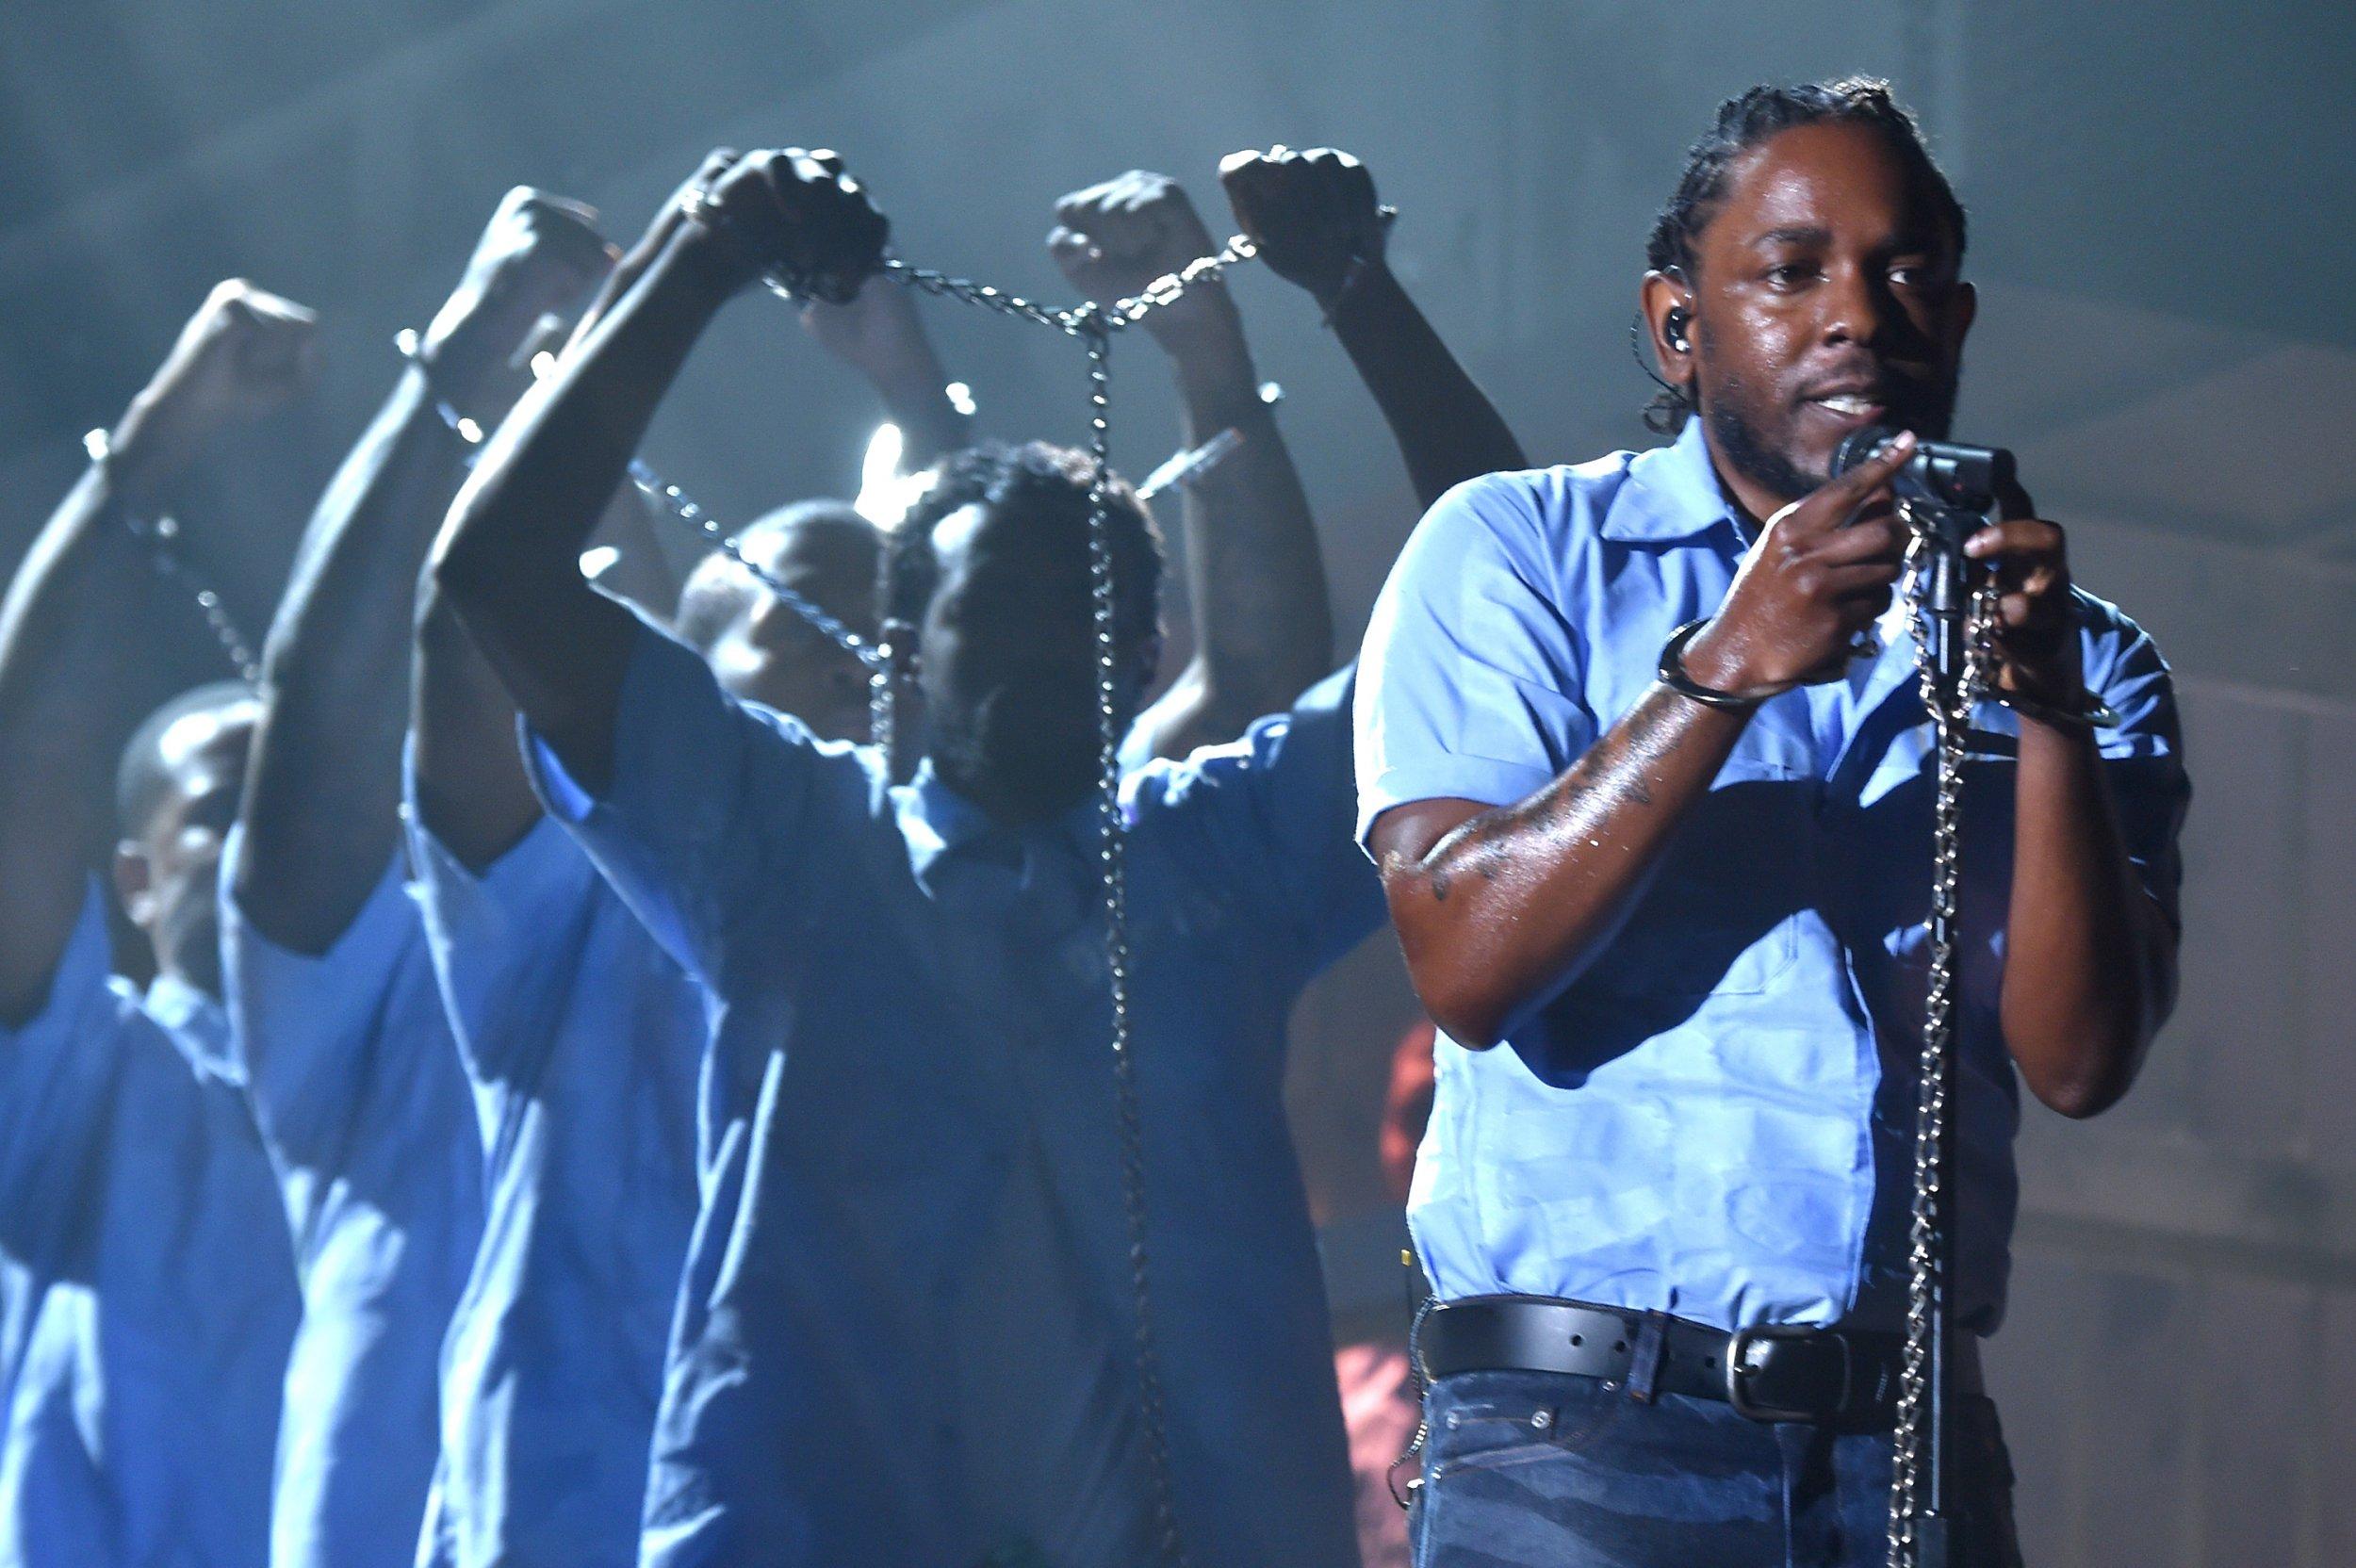 Kendrick Lamar at Grammys 2016